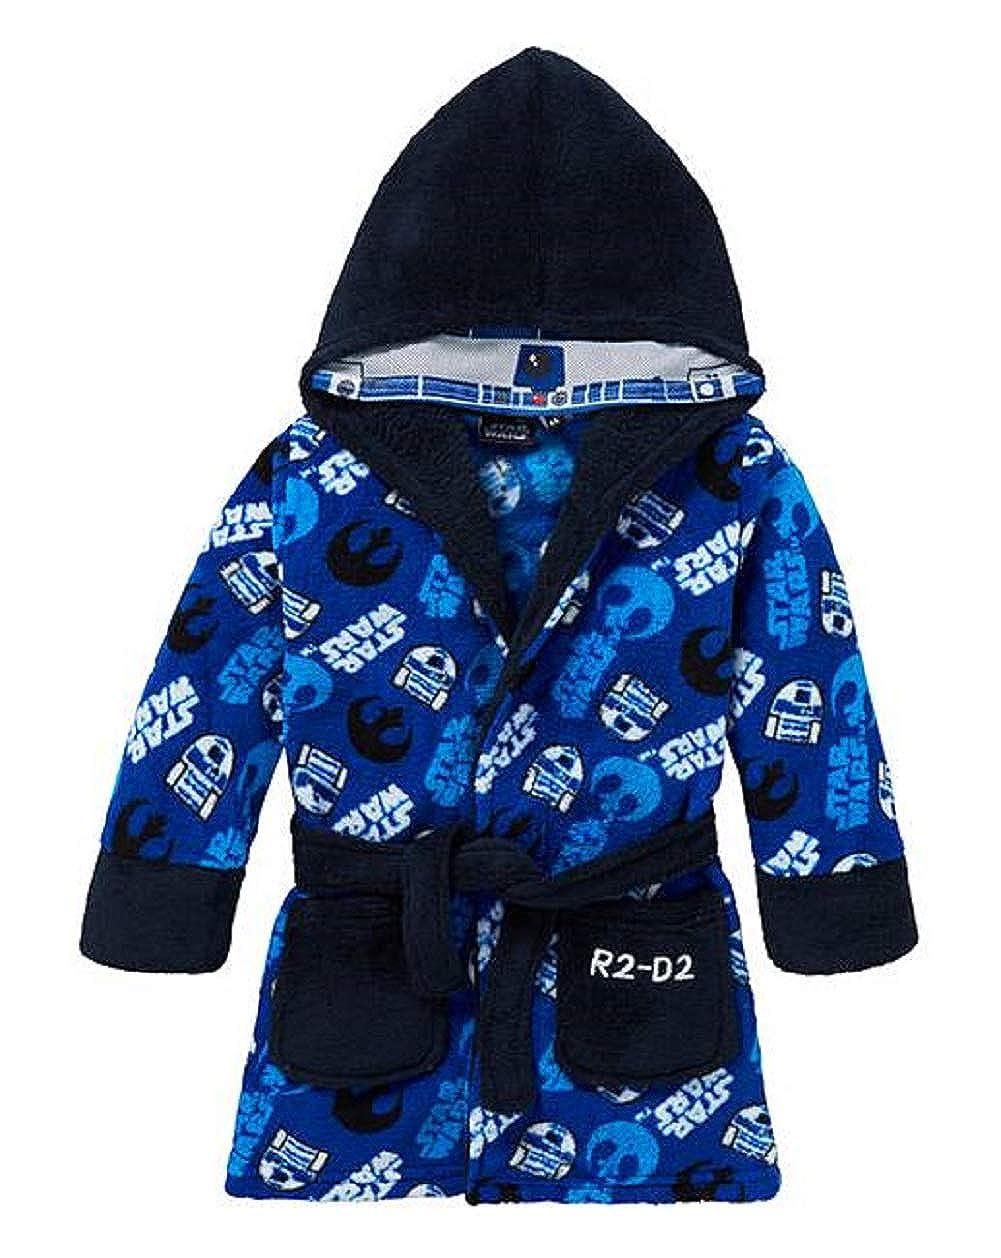 Boys Star Wars Dressing Gown Size 3 4 5 6 7 8 9 10 Darth Vader Character Fleece Bathrobe